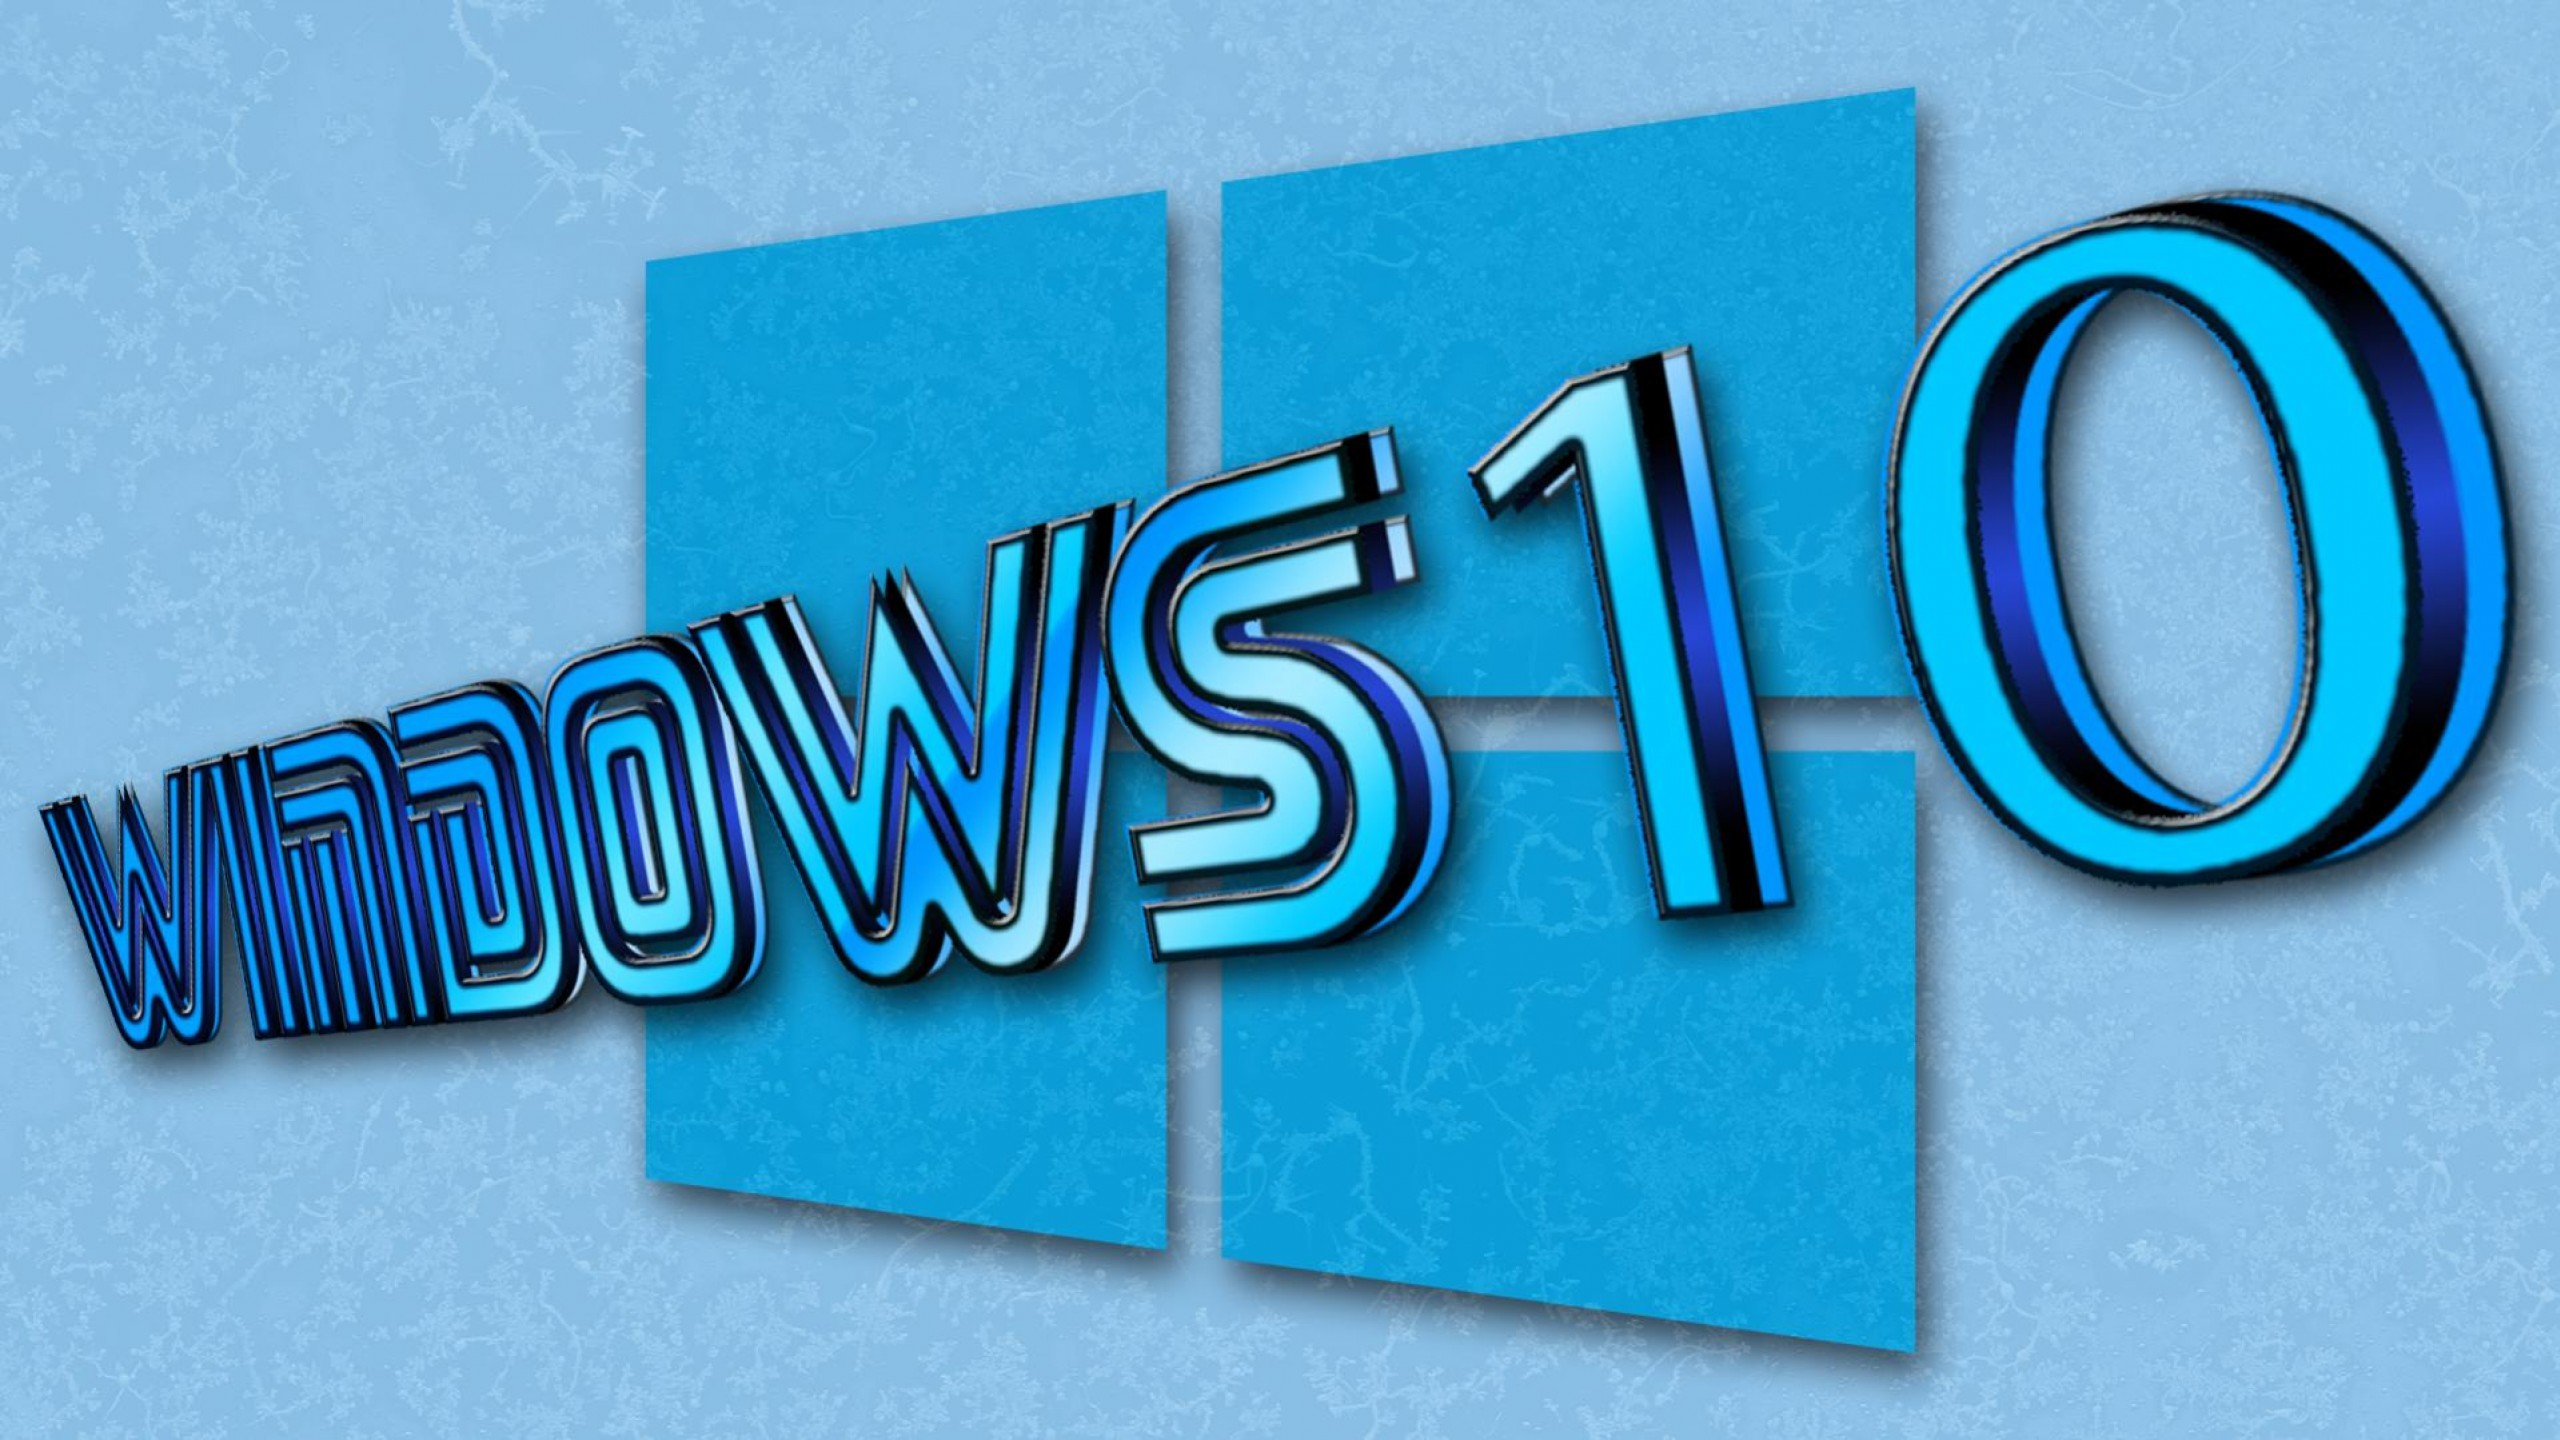 Windows 10 Logo wallpaper